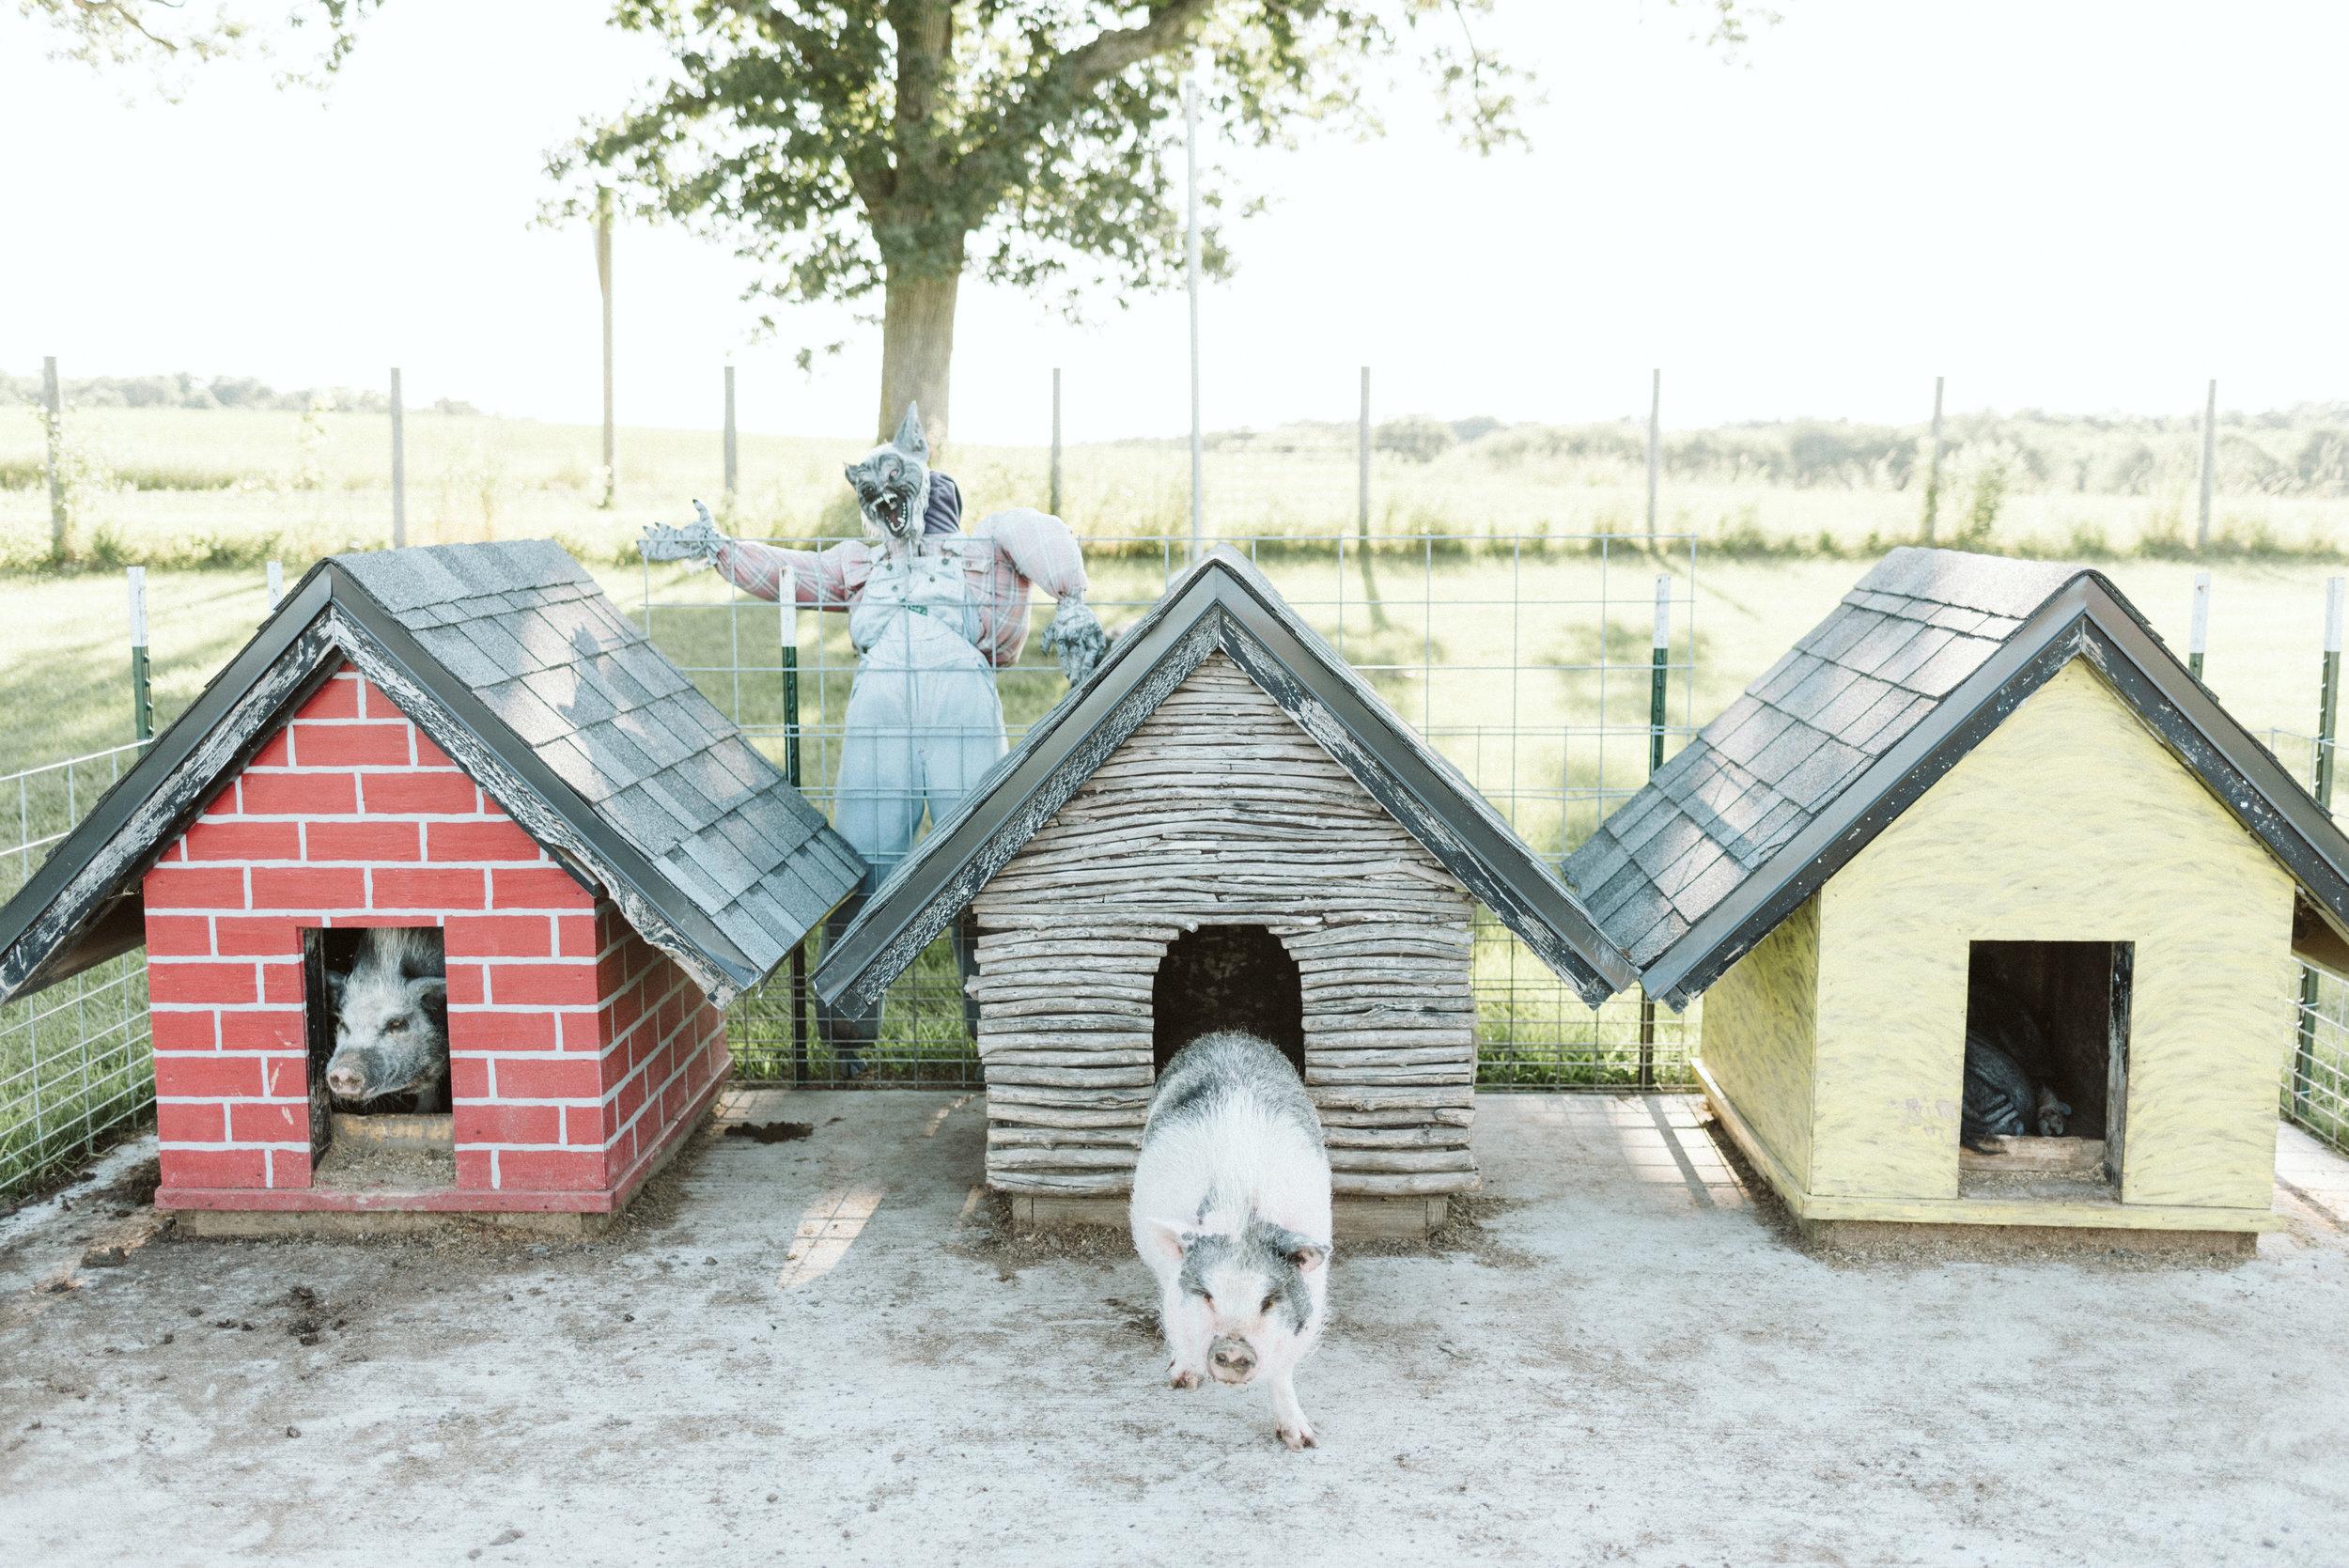 Busy-Barns-Adventure-Farm_Wedding _Fort_atkinson_Wisconsin-Gavyn-Taylor-Photo (2 of 2).jpg